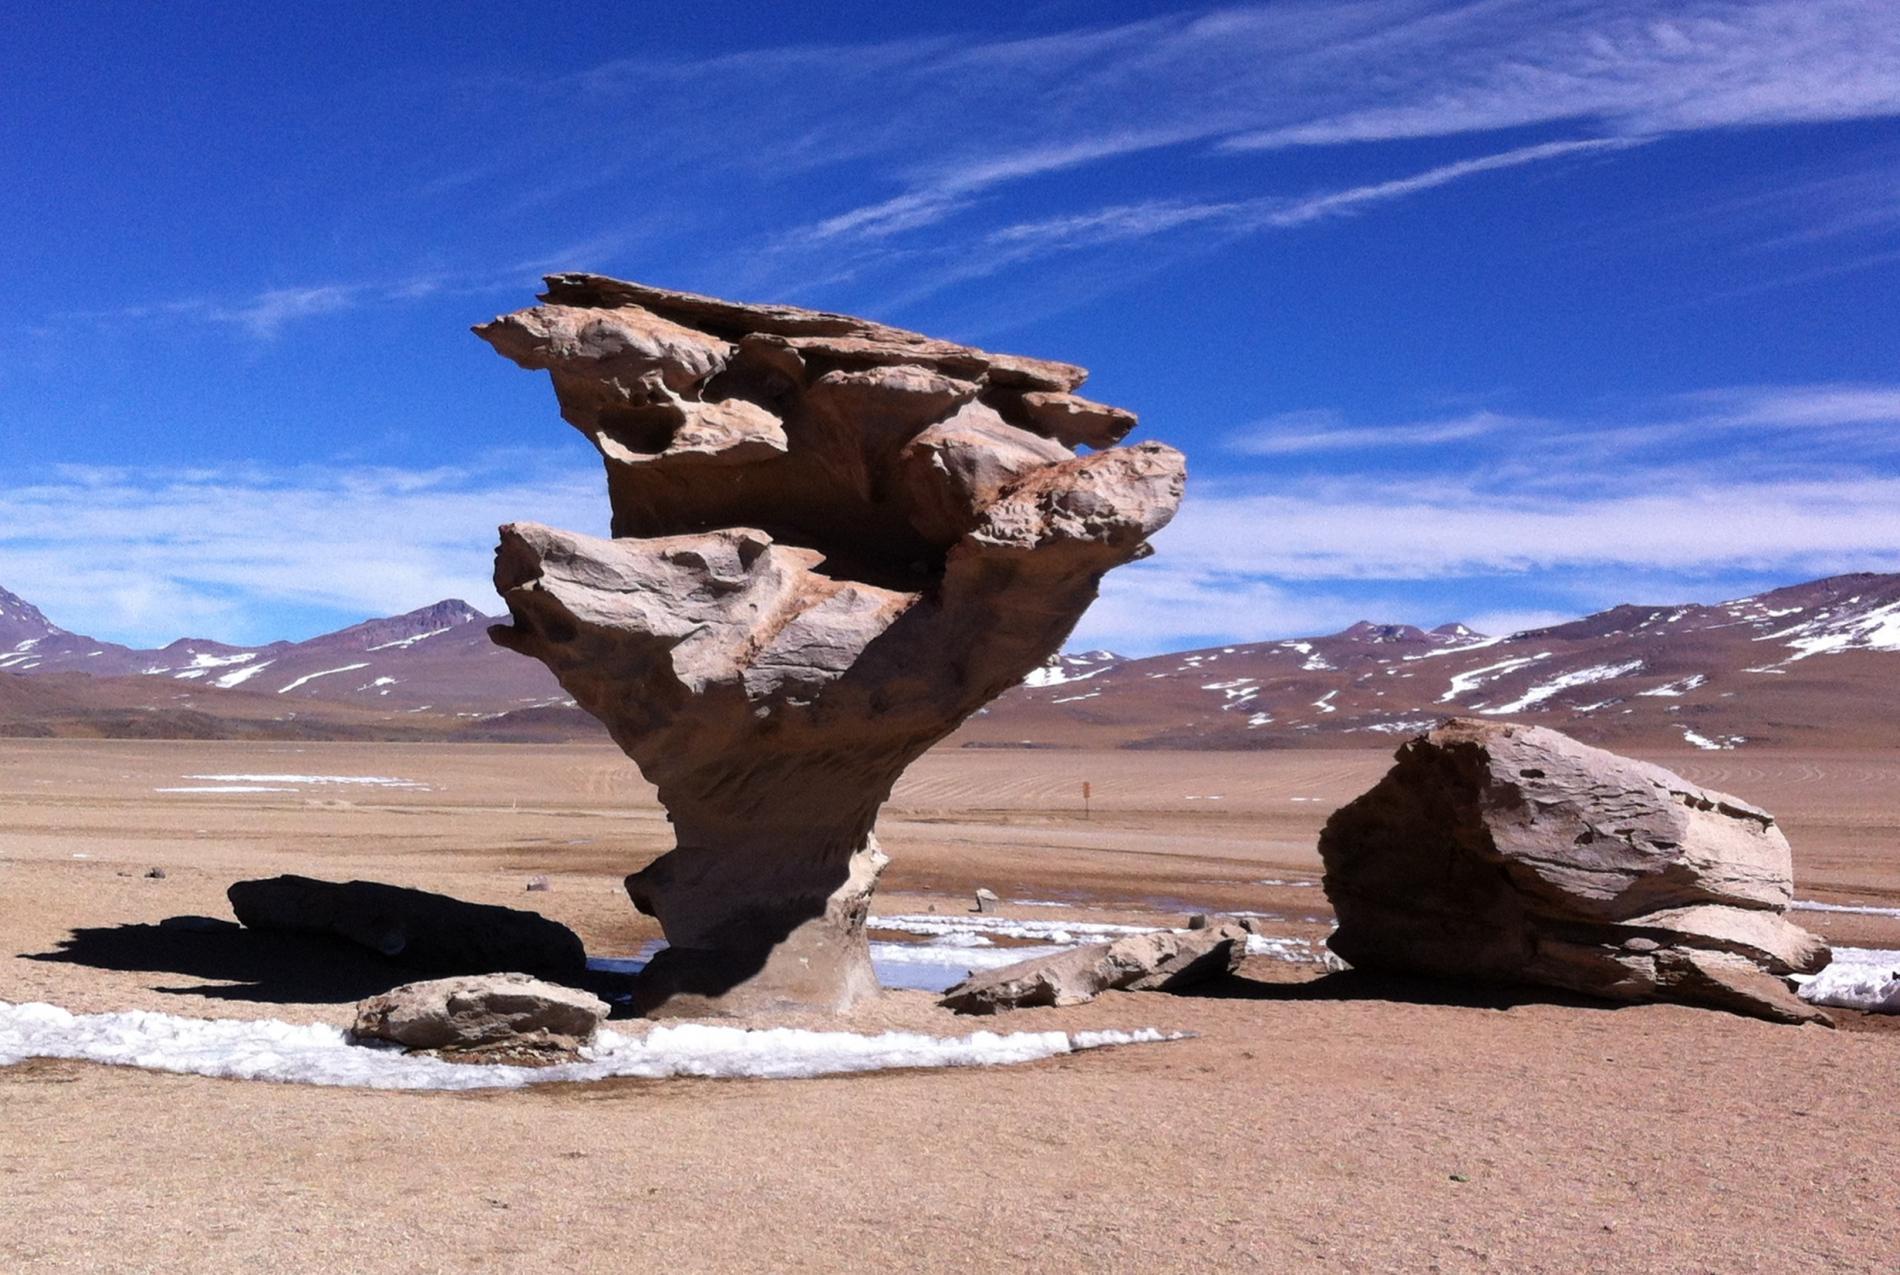 Voyage solidaire Bolivie : Vision du Monde - Photo 2